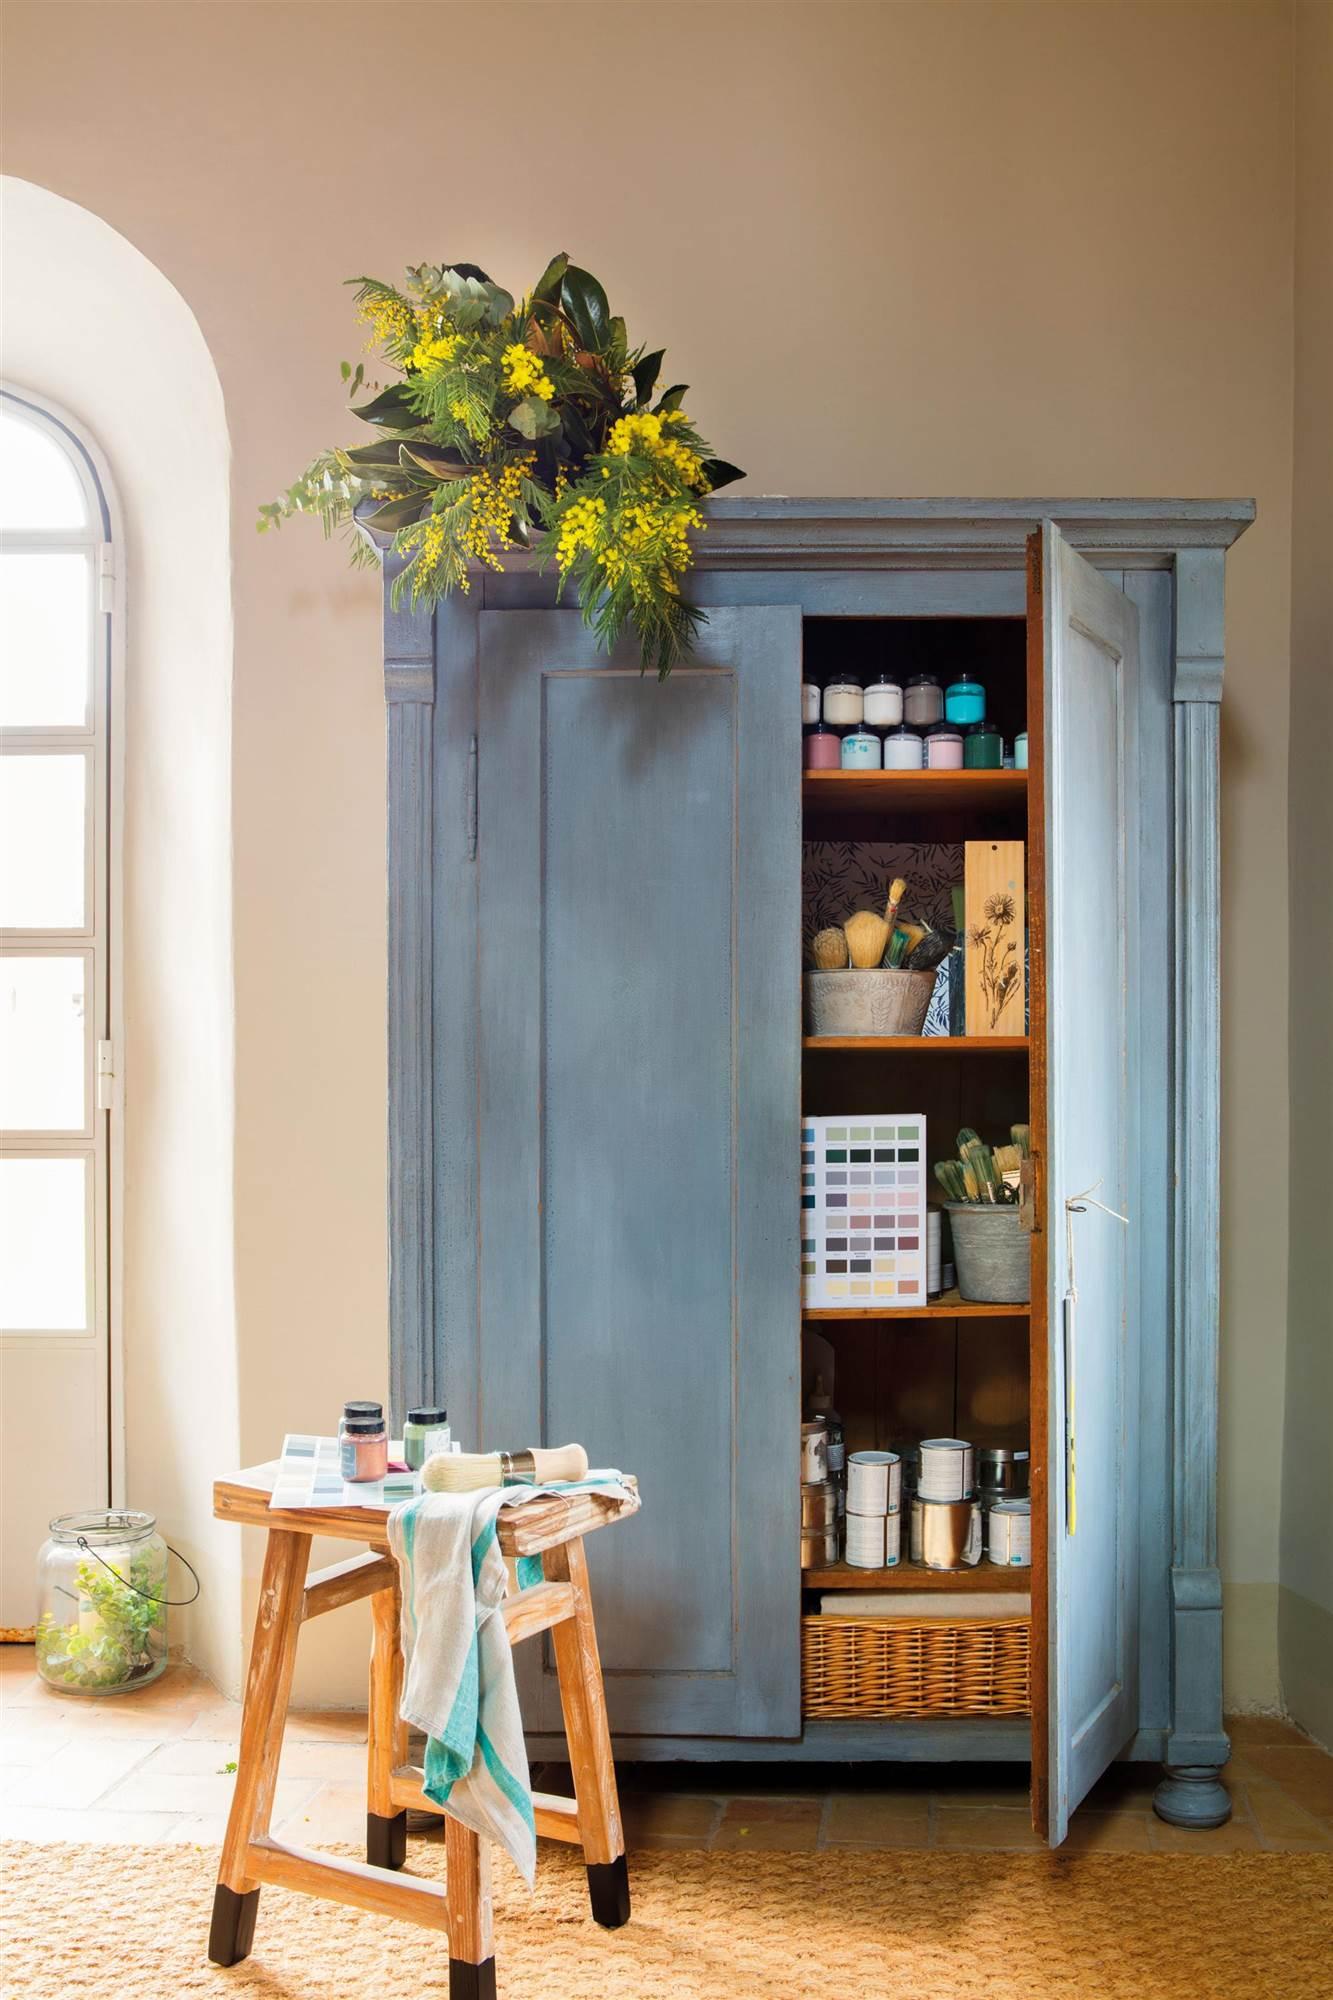 Cómo pintar muebles antiguos, modernos, de madera...